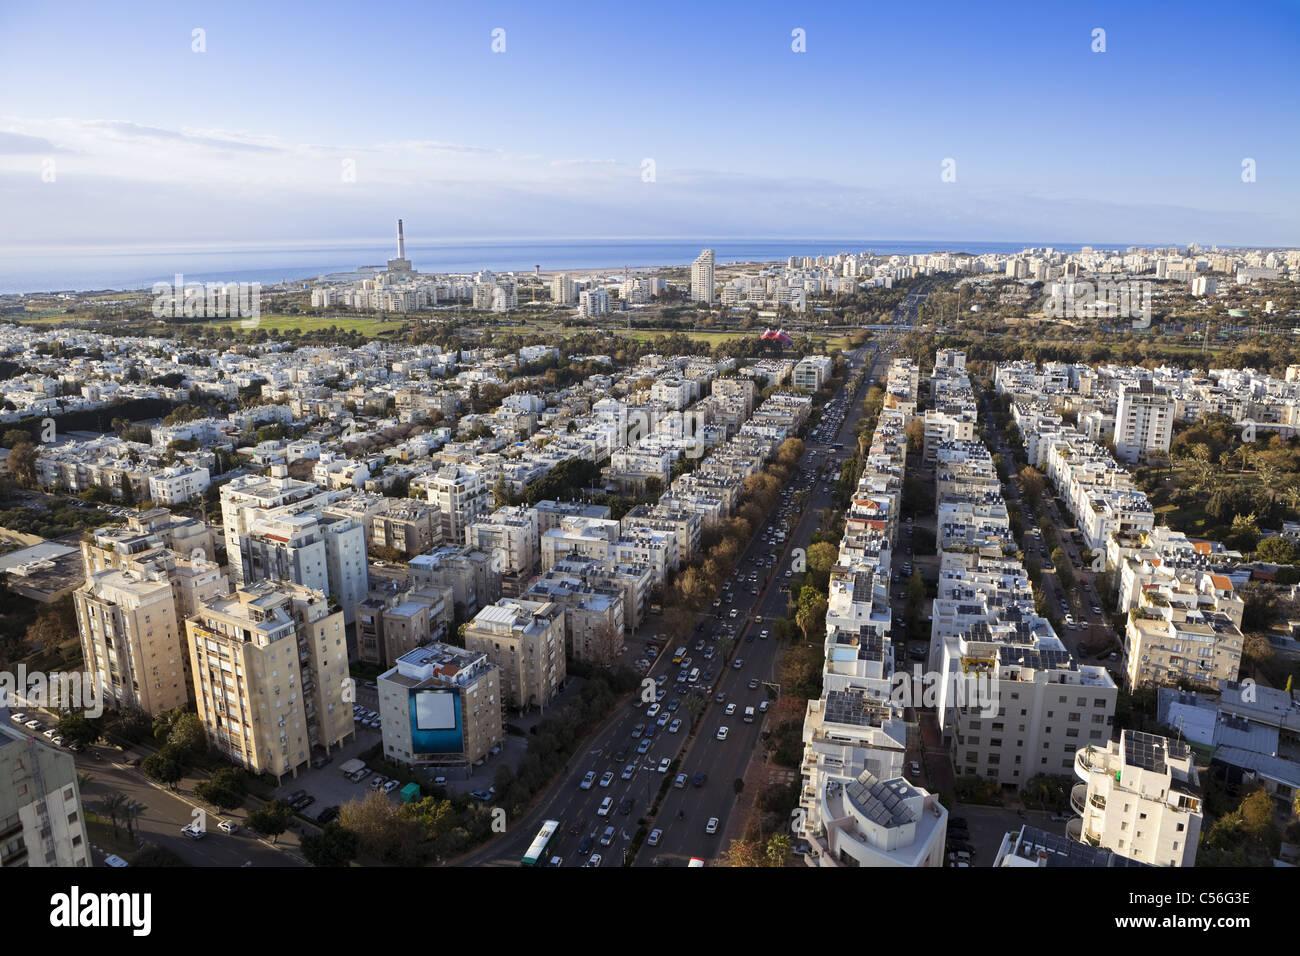 Skyline von Tel Aviv / Aerial view von Tel Aviv Stockbild